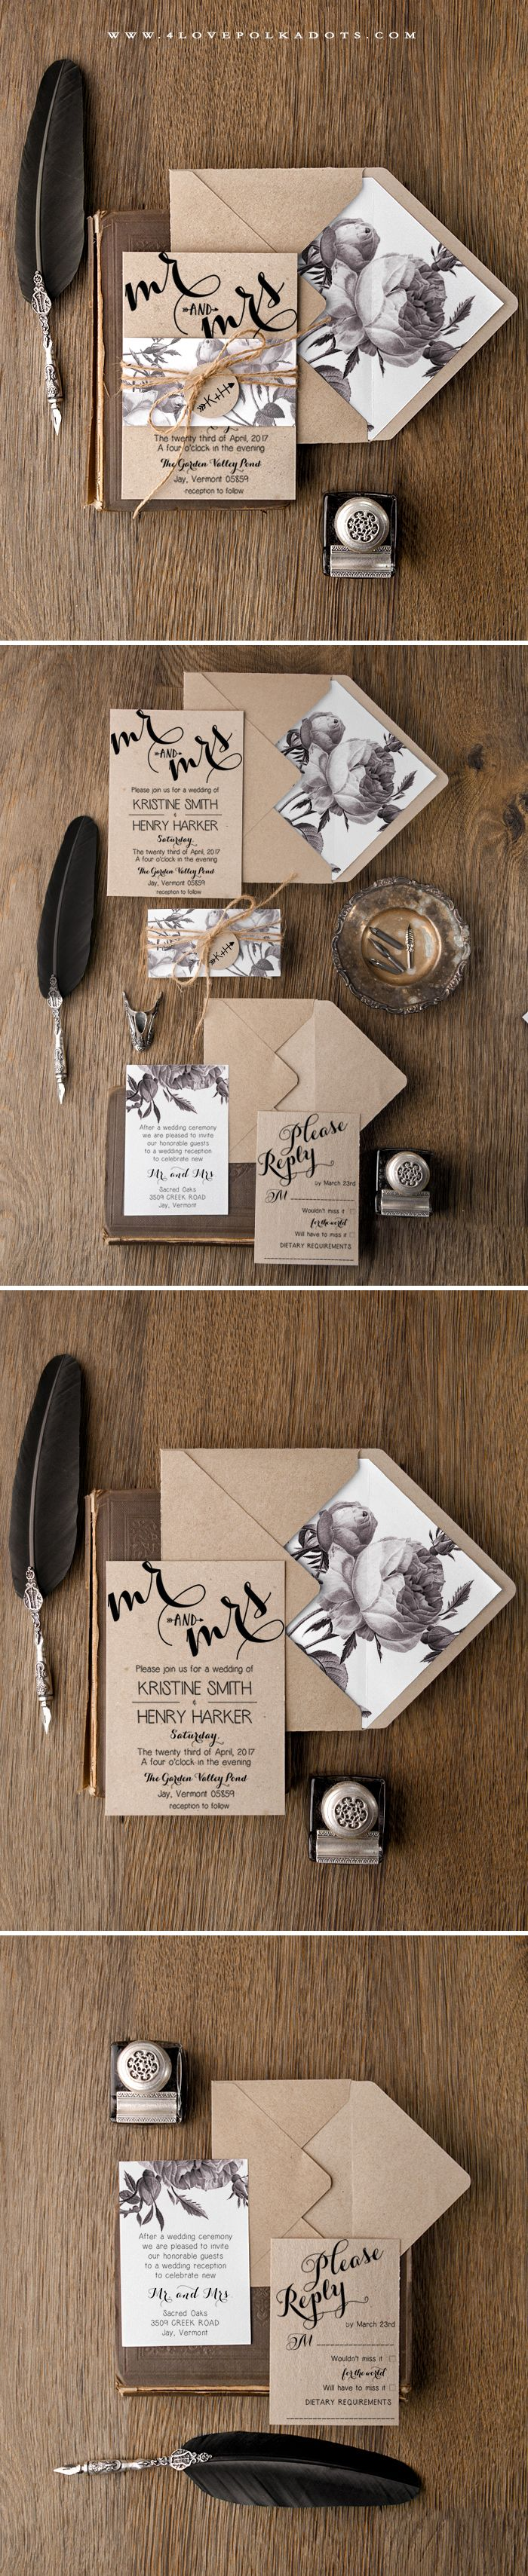 Handmade Wedding Invitation - Eco Papers, Floral Printing & Calligraphy writing #weddingideas #boho #rustic